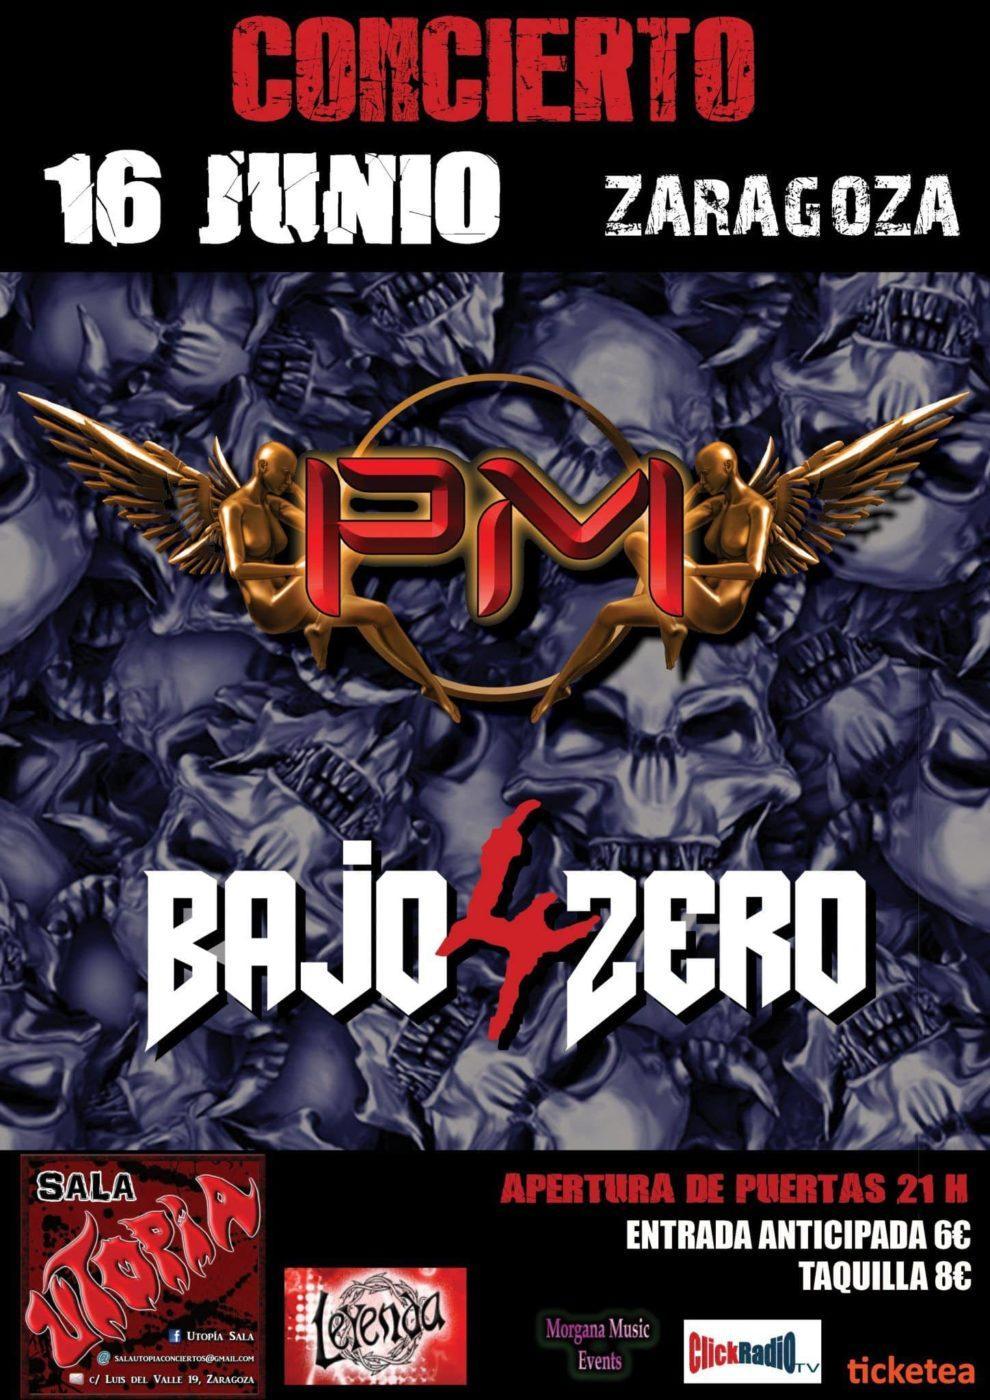 AsaltoMata Show 377: 4bajoZero PM (podcast y video playlist)